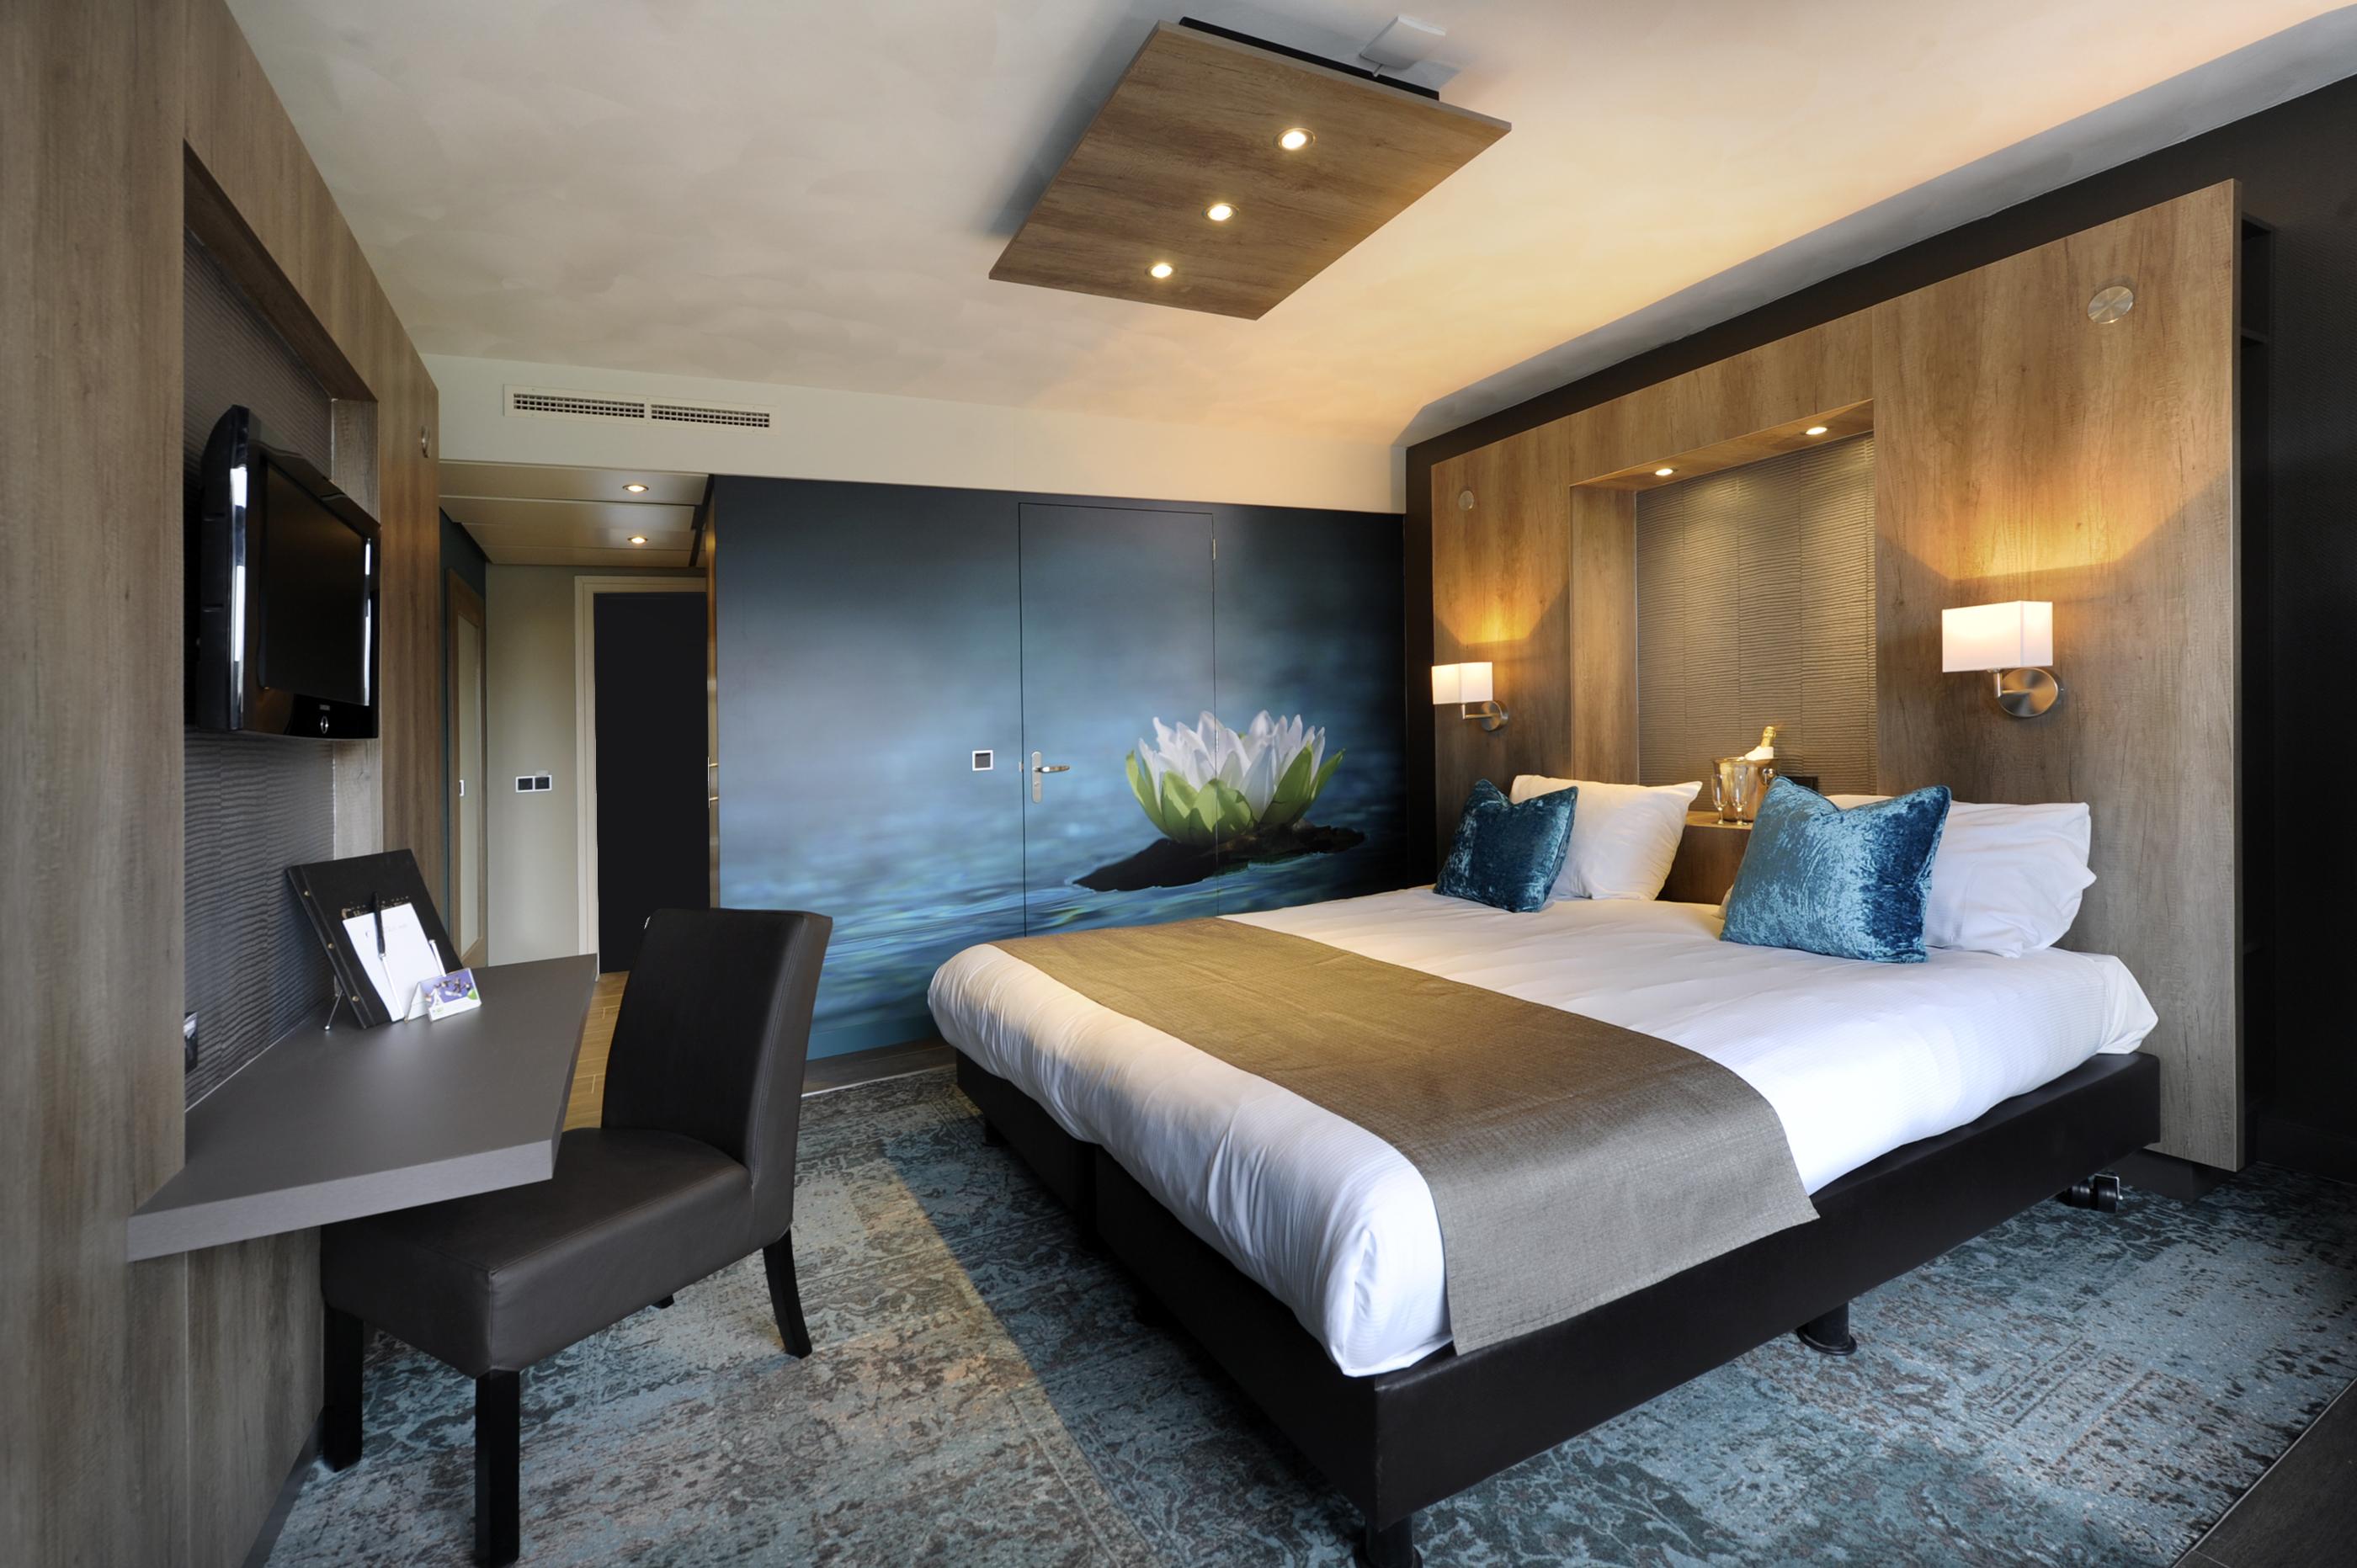 Van Der Valk Gilze  Hotel Tilburg A58  Kamers  Restaurant. Picture Points Terraces. Crowne Plaza Huangshan Yucheng Hotel. Narges Hotel. Glenmoor By The Sea Hotel. Hotel Maison Polanka. El Mouradi Hotel. Hotel Sympozjum And Spa. Saint Sauveur Hotel